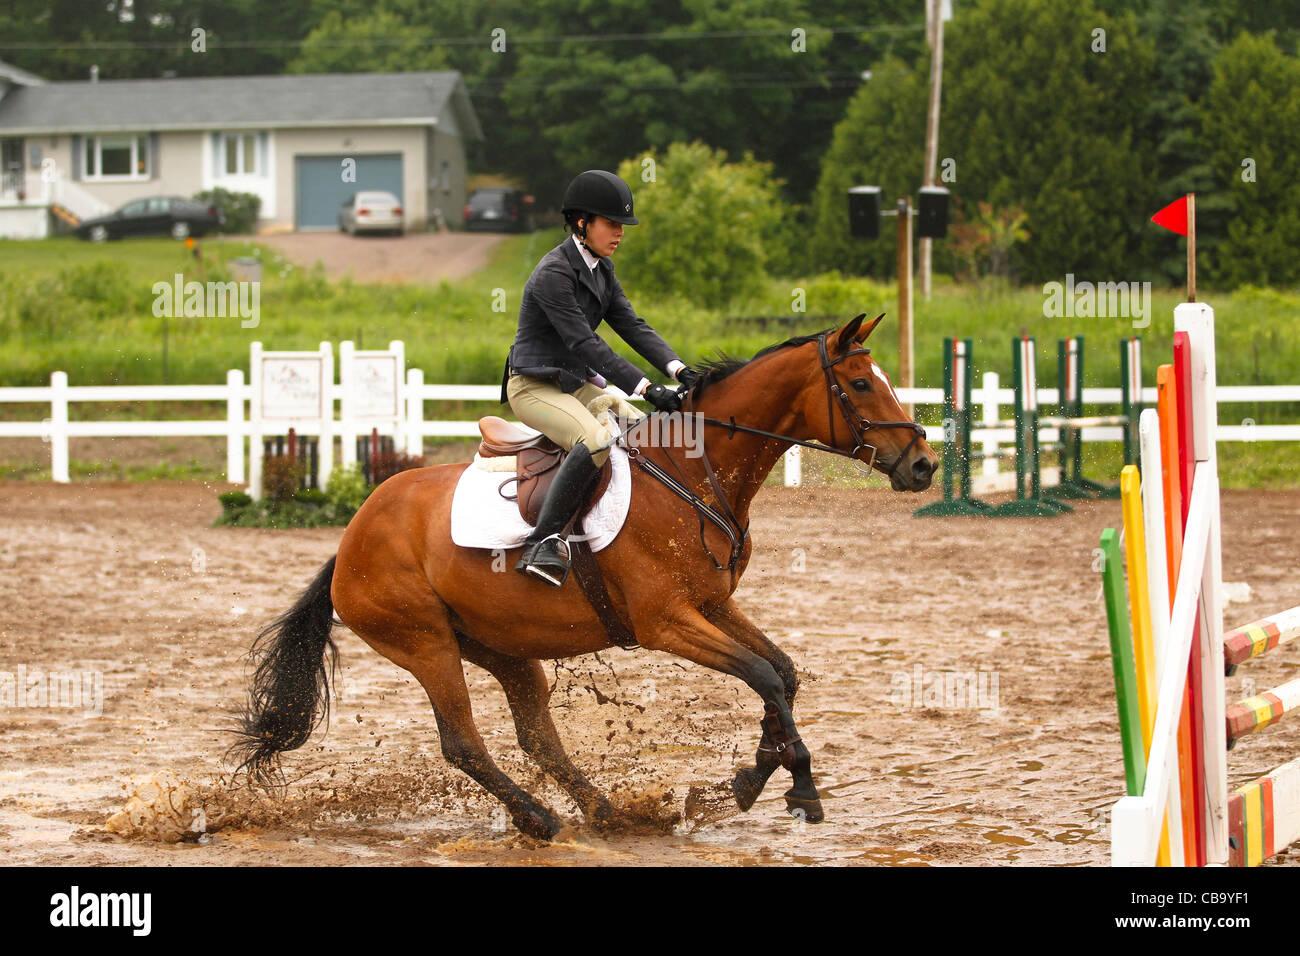 Bay horse jumping - Stock Image